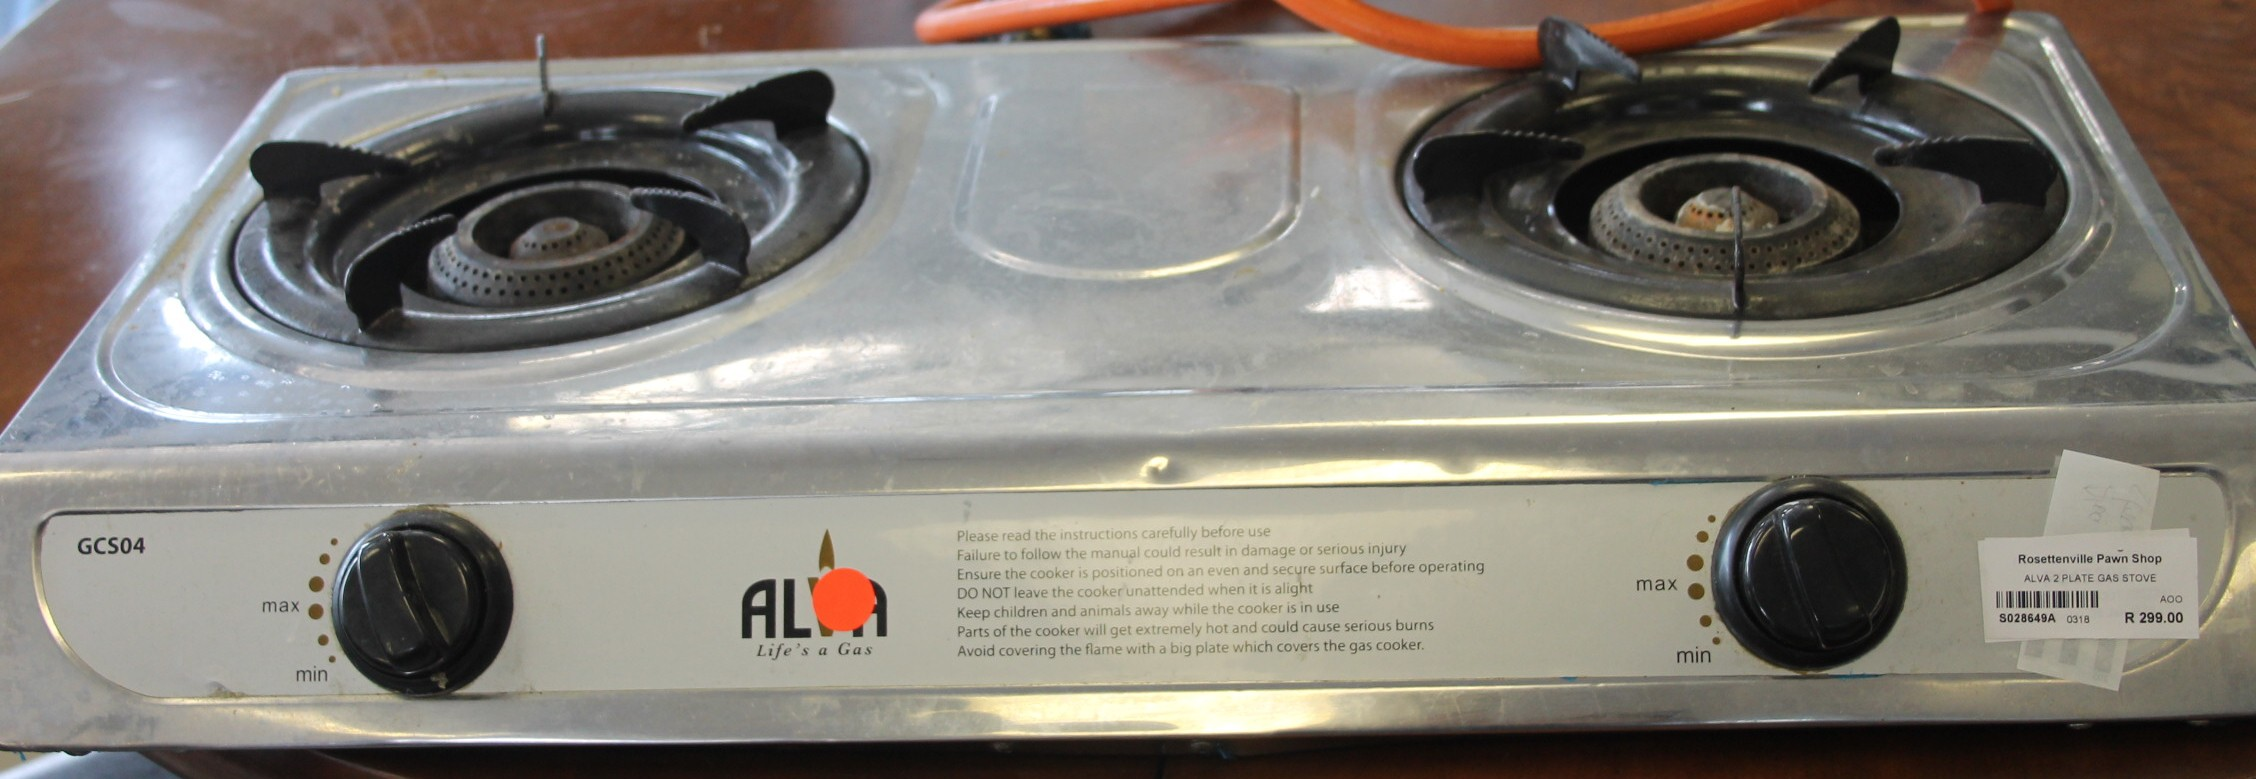 Alva gas stove S028649a #Rosettenvillepawnshop